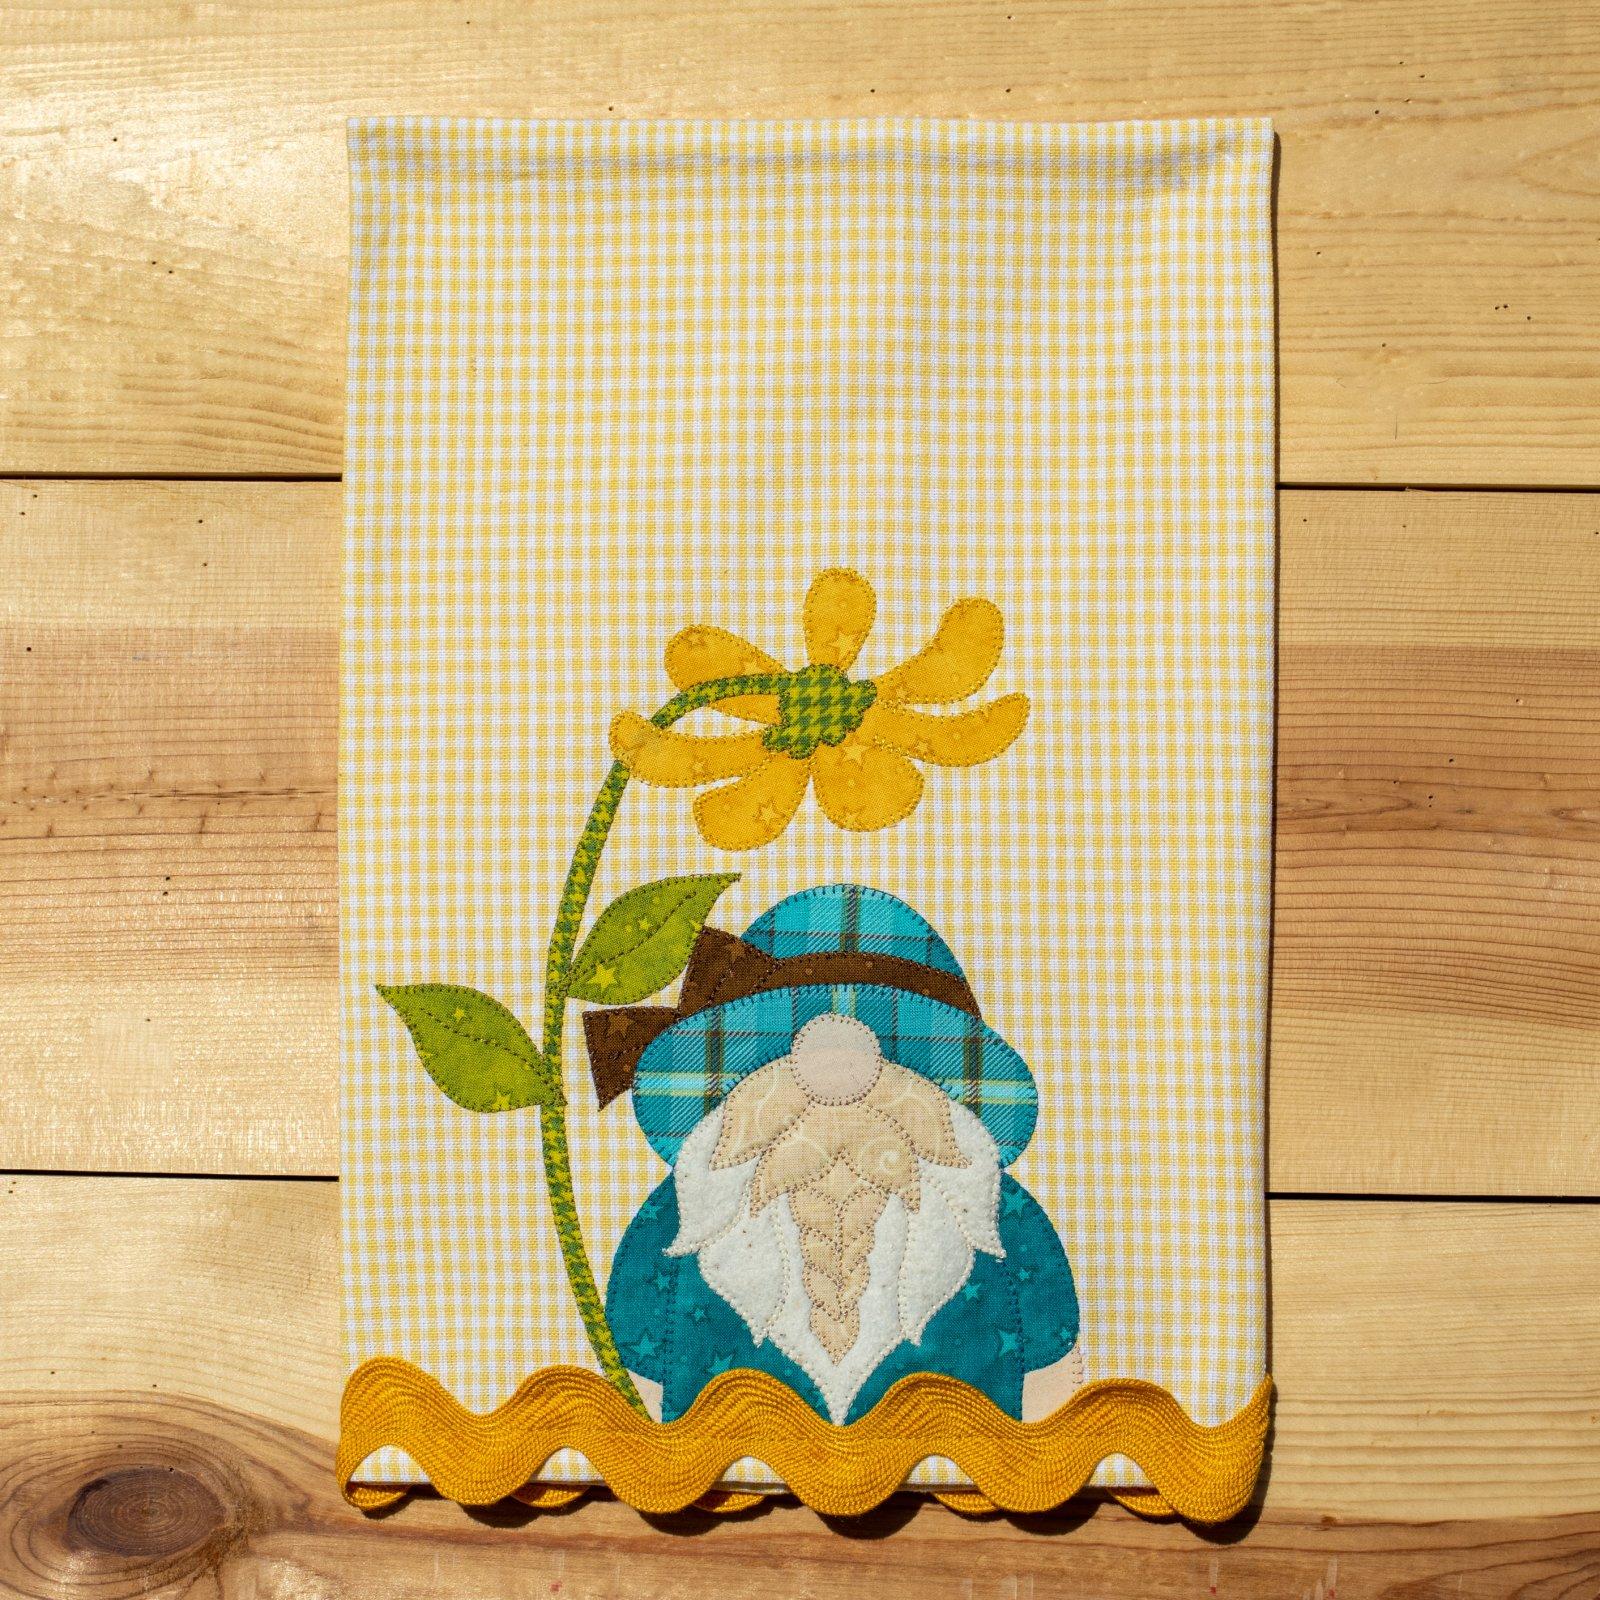 Spring Gnome Applique Tea Towel Kit